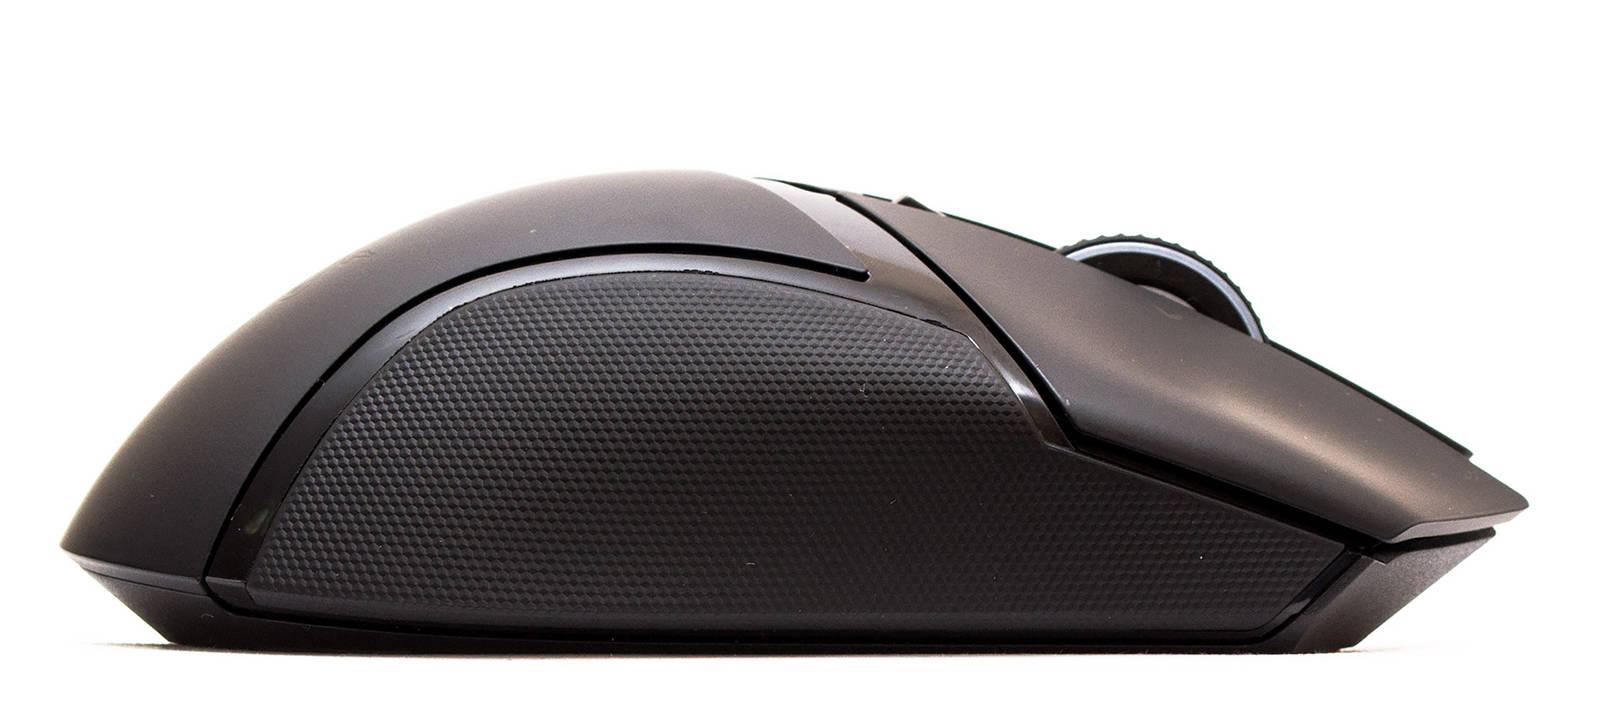 Мышь Razer Basilisk Ultimate. Фото 13